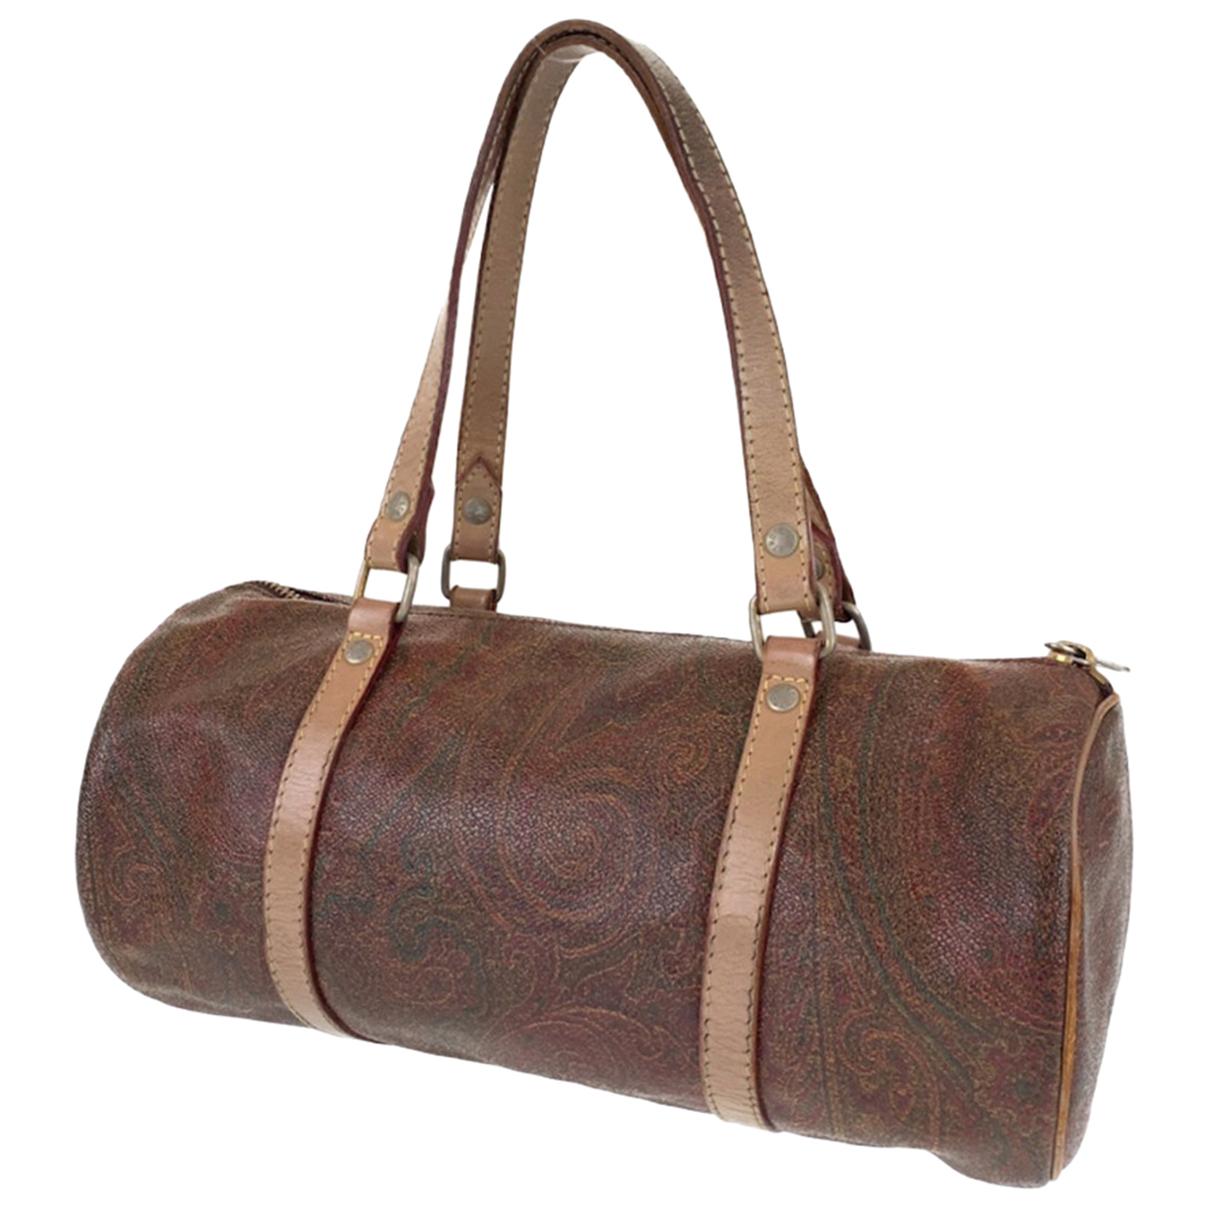 Etro N handbag for Women N